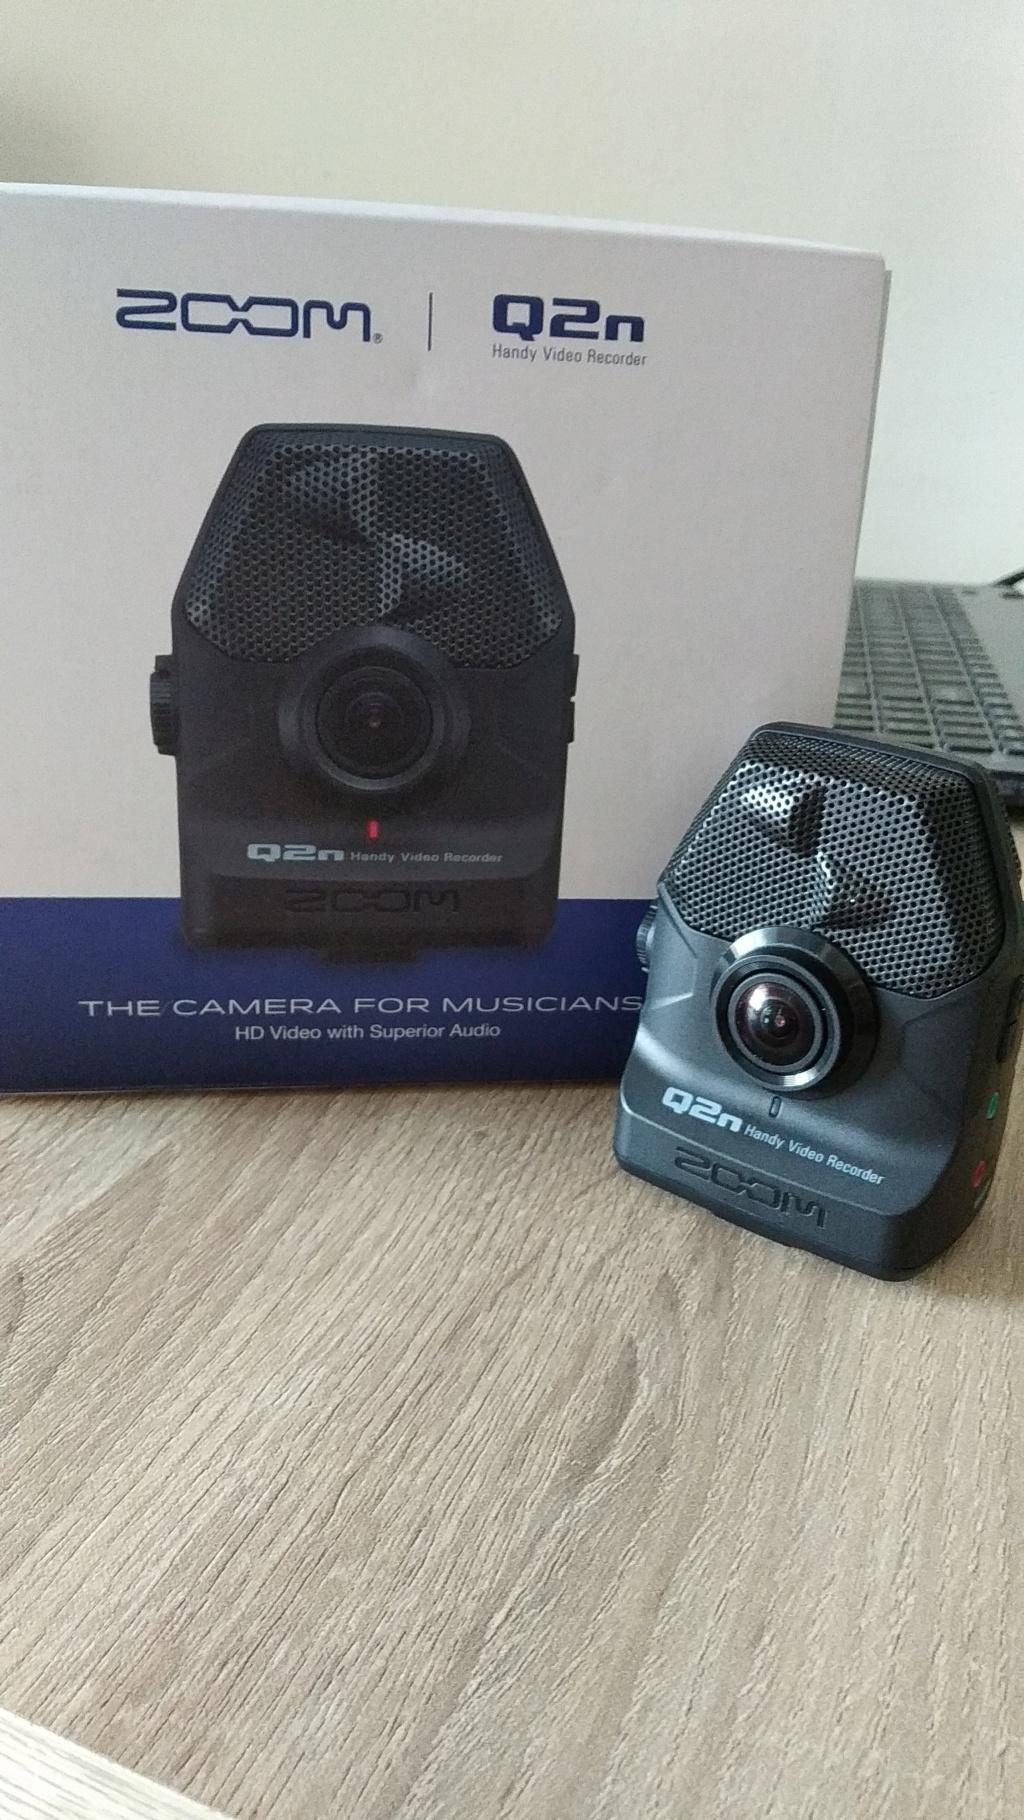 Zoom q2N handy video recorder Img_2017